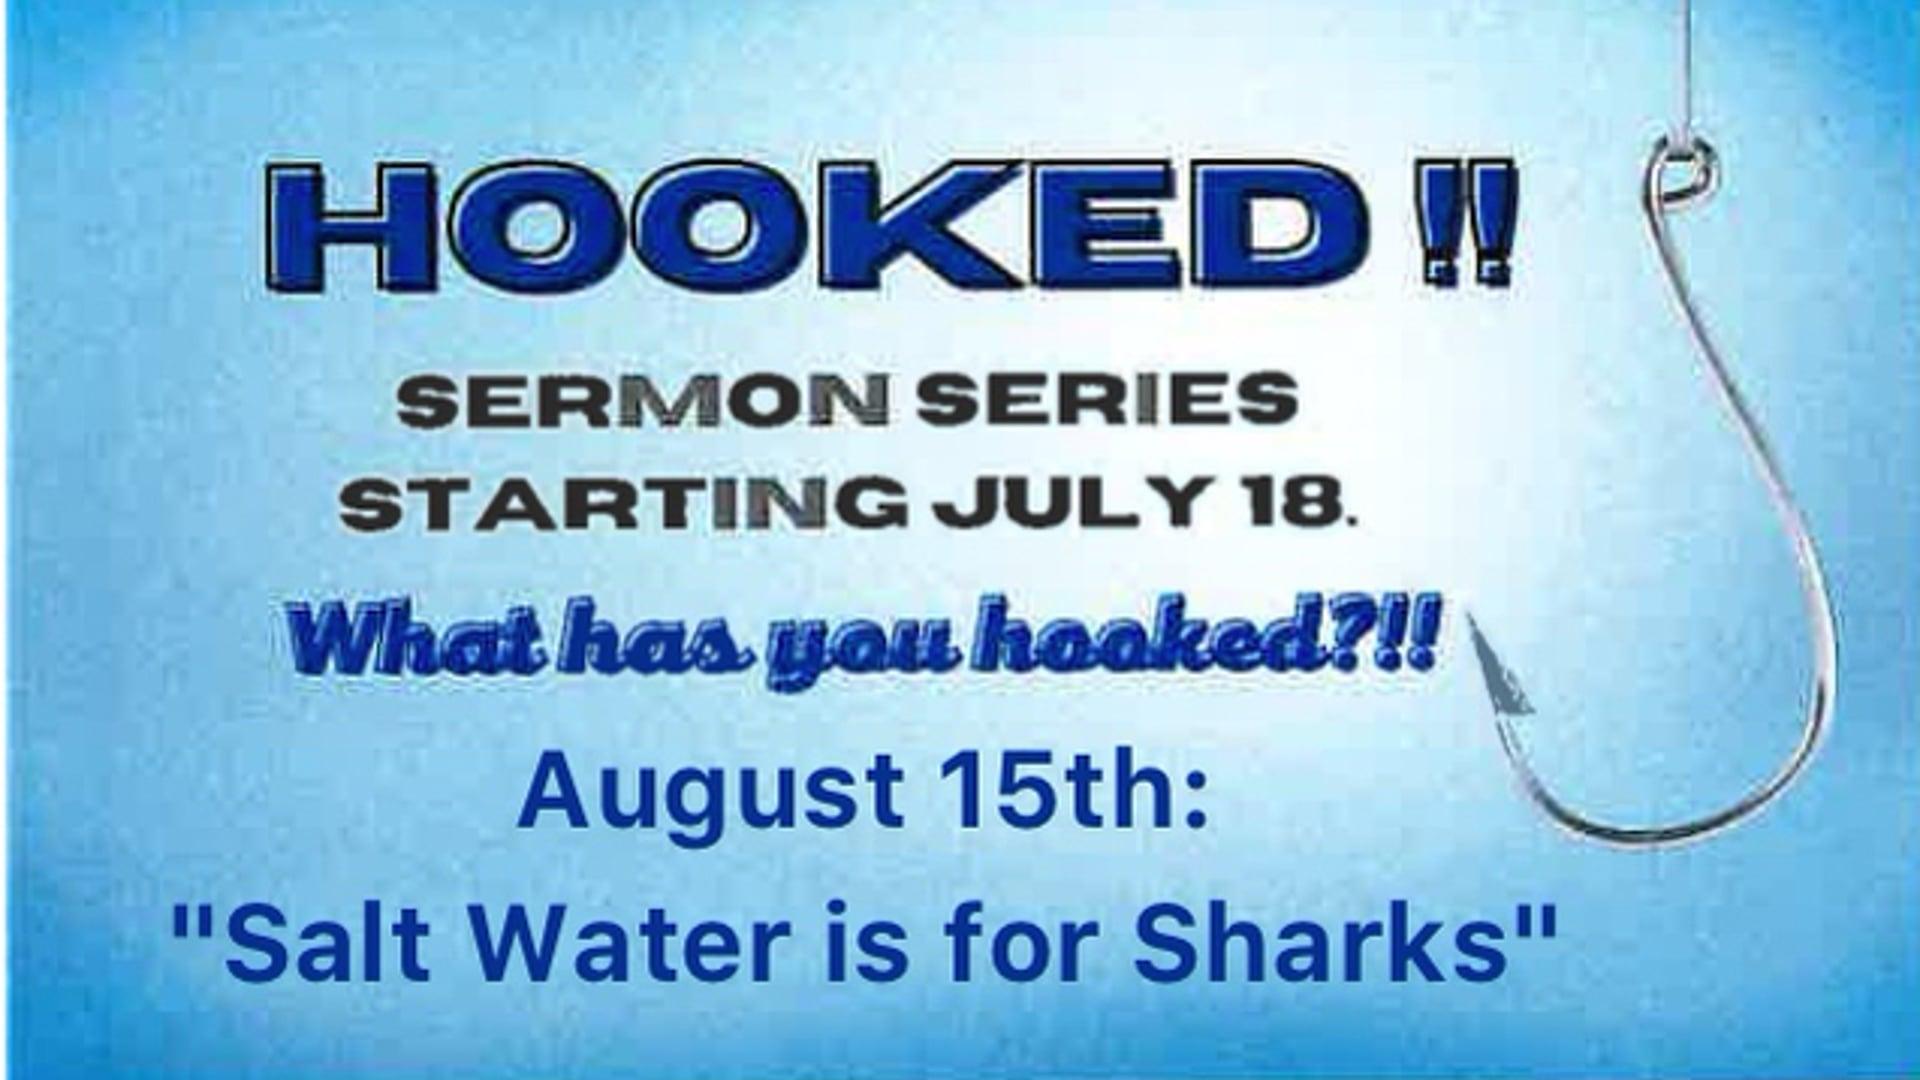 Royston Baptist Church 11 AM Worship Service Message for Aug. 15, 2021